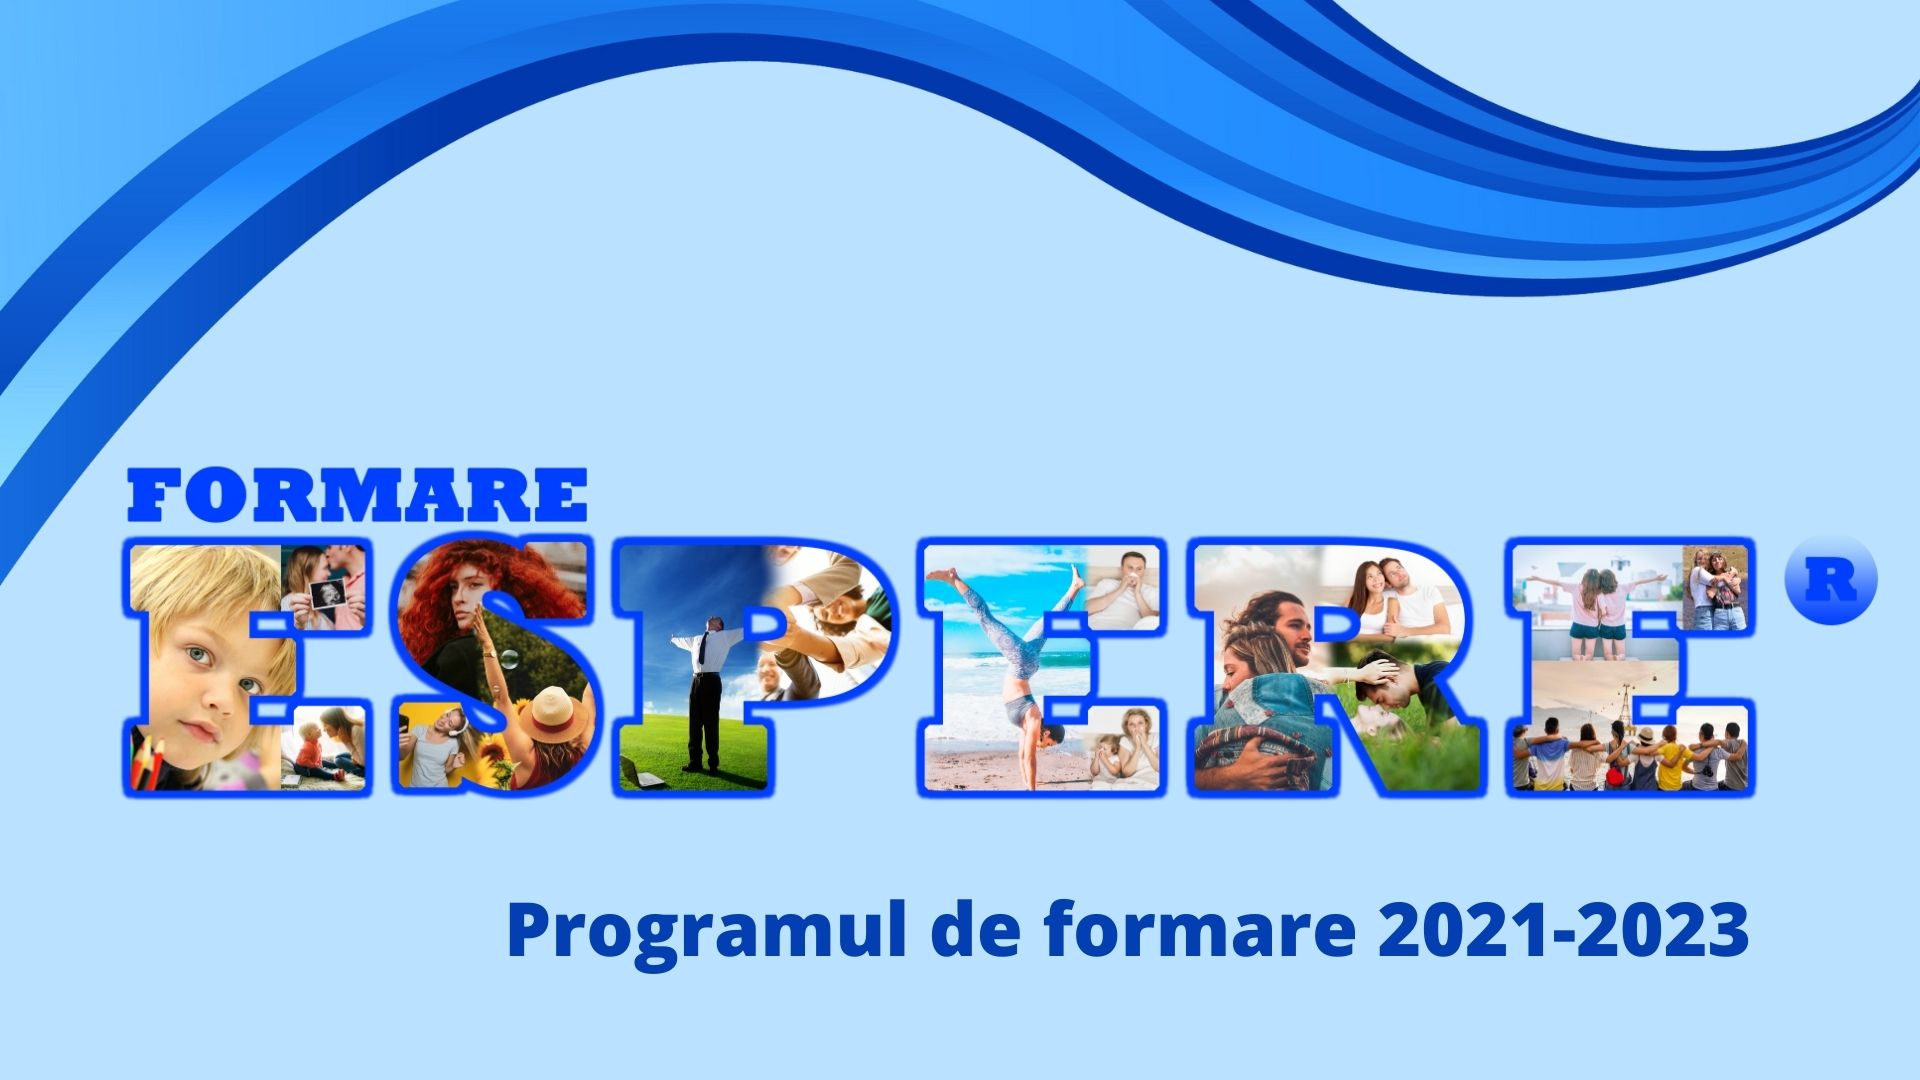 Formare in Metoda ESPERE grupa 2021-2023